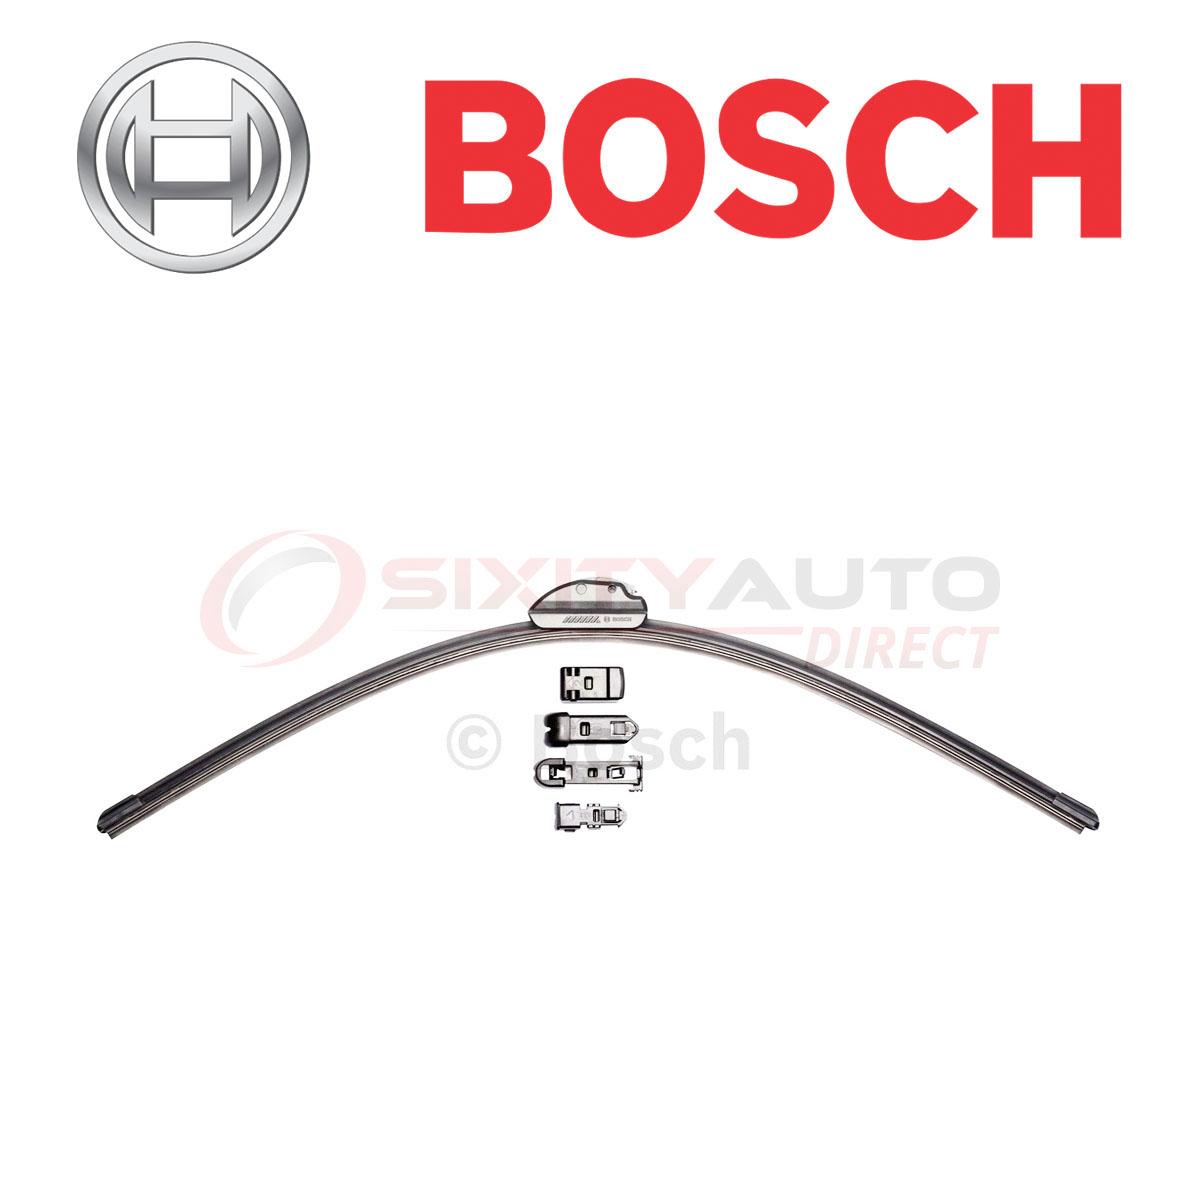 Bosch Clear Advantage Windshield Wiper Blade For 2014-2016